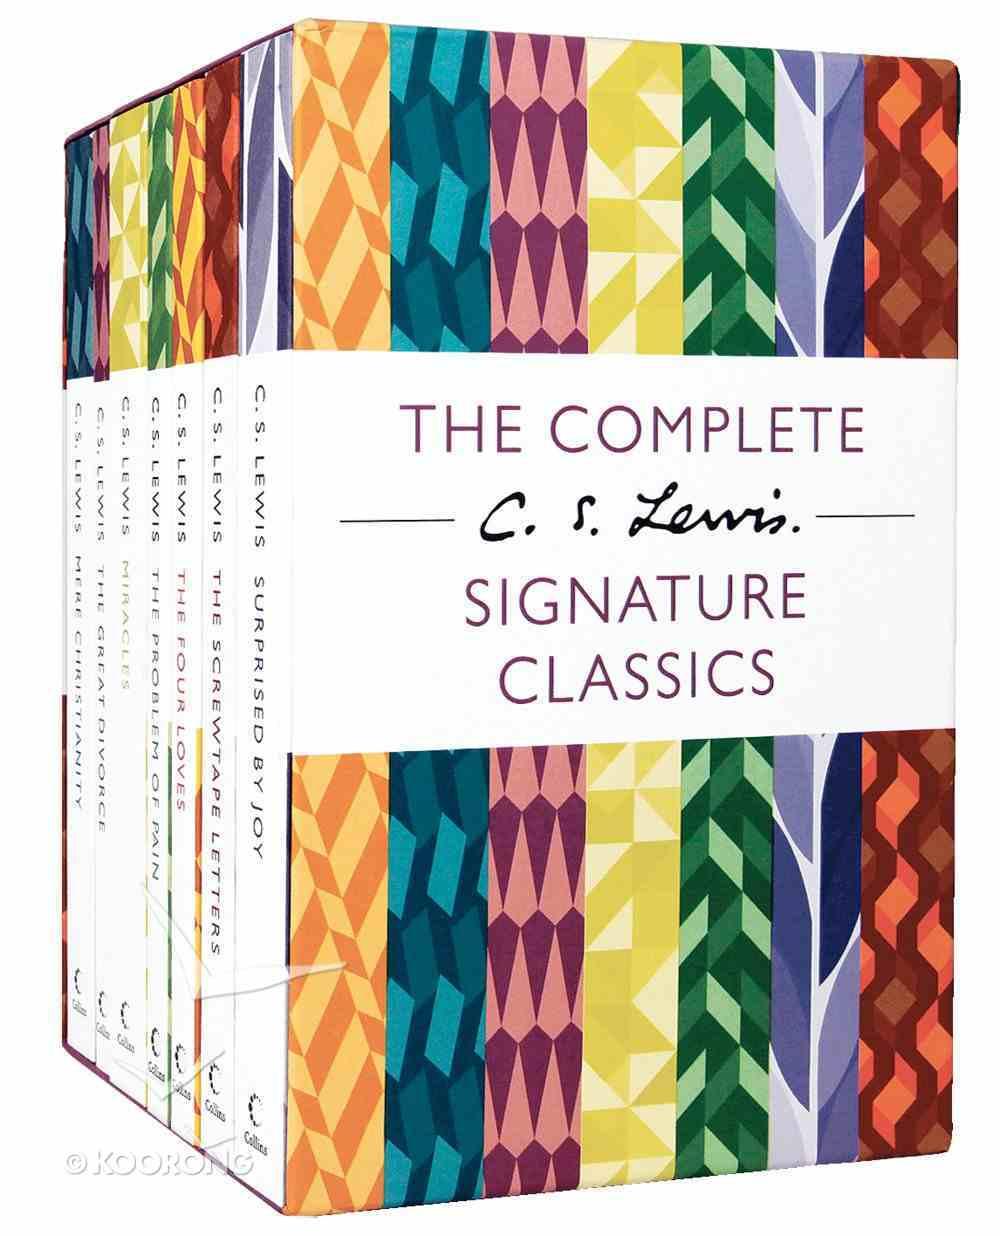 Lewis Signature Classics 7 Book Boxed Set Box